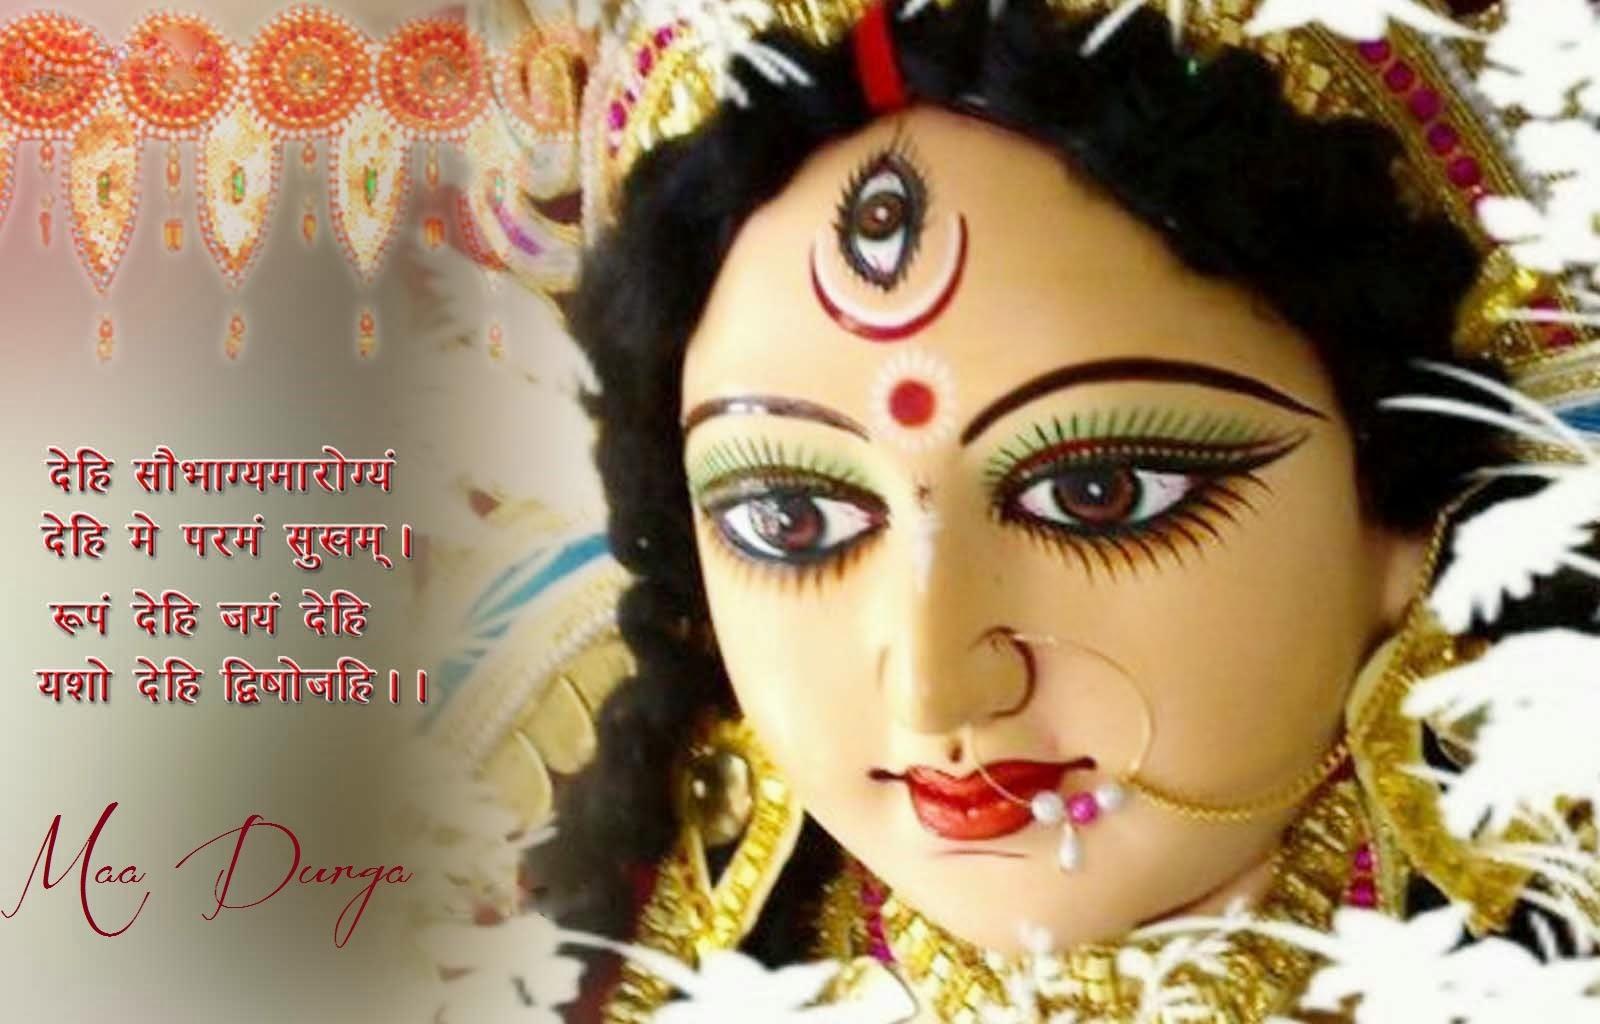 45 Hd Durga Maa Wallpapers On Wallpapersafari